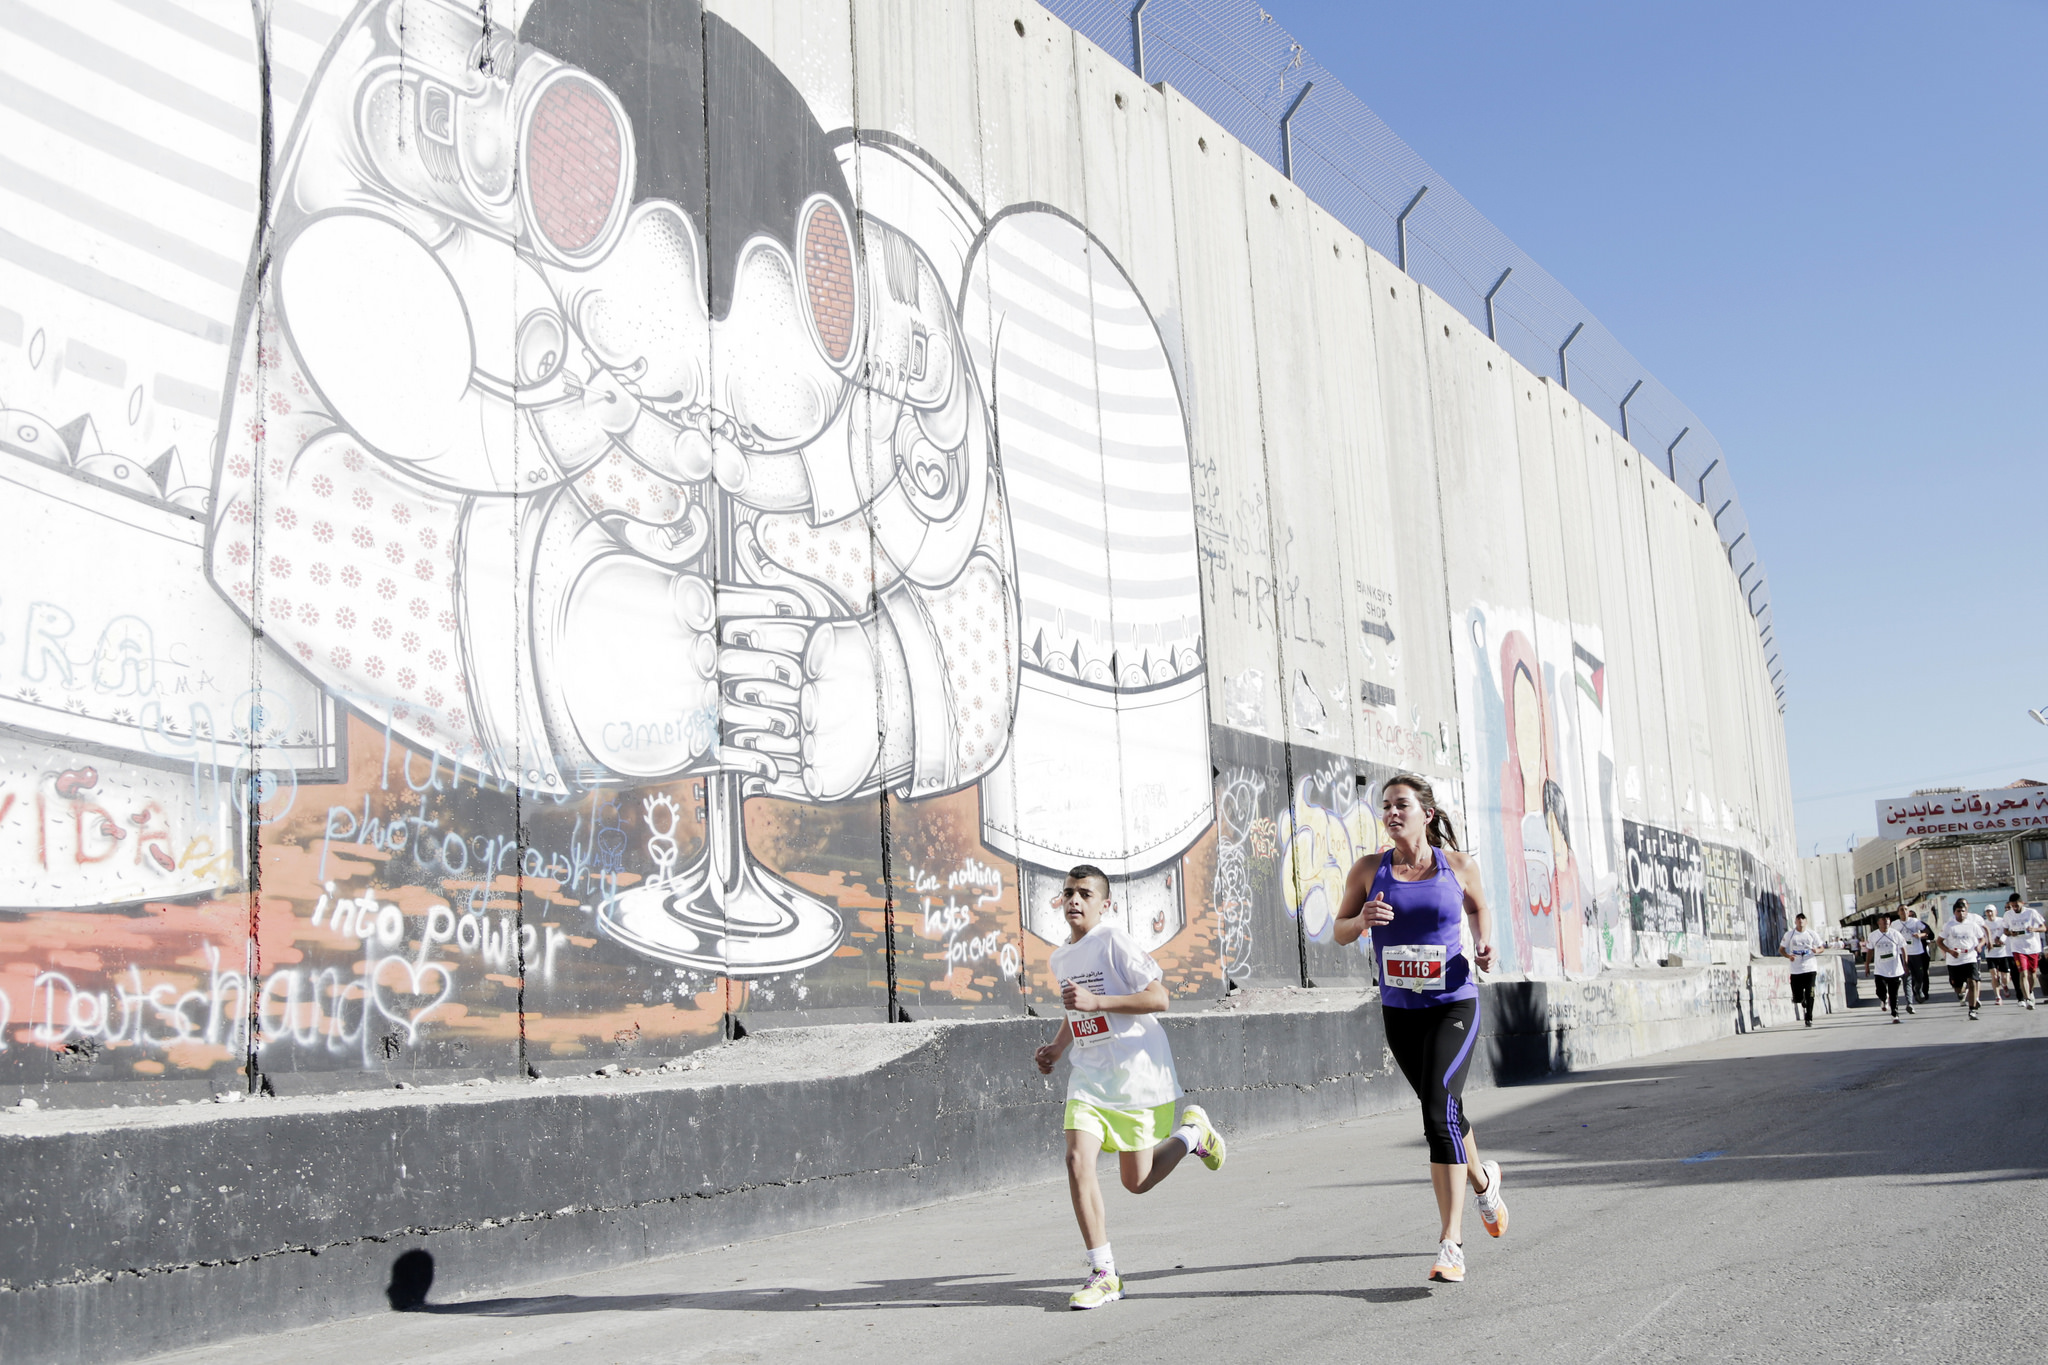 Corriendo junto al muro